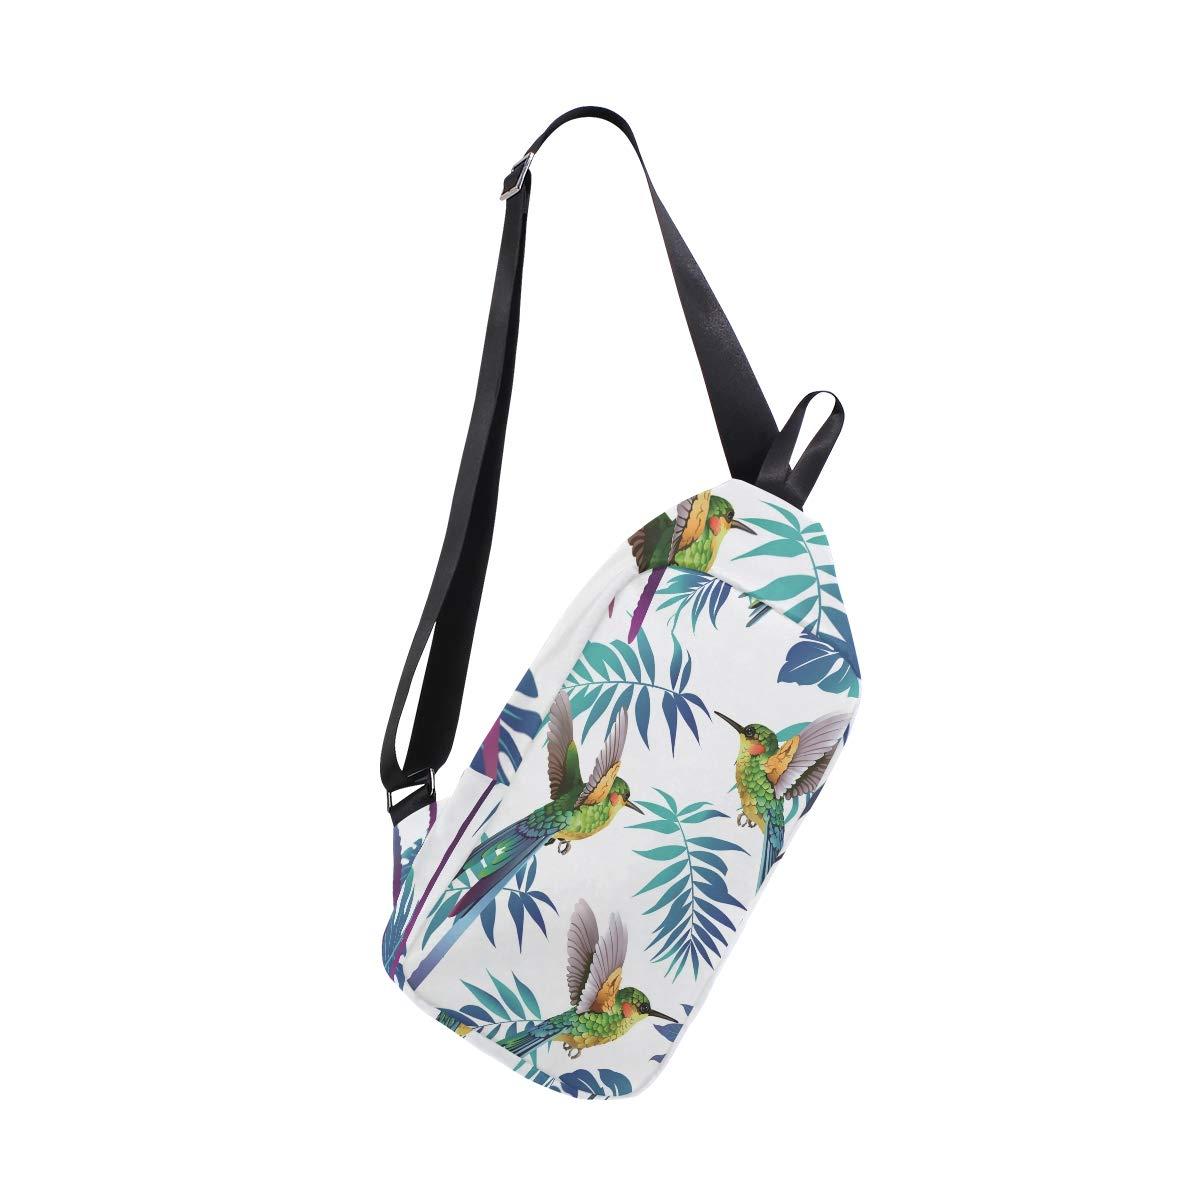 AHOMY Hummingbird Tropical Leaf Messenger Bag Small Travel School Sling Bag Crossbody Bag